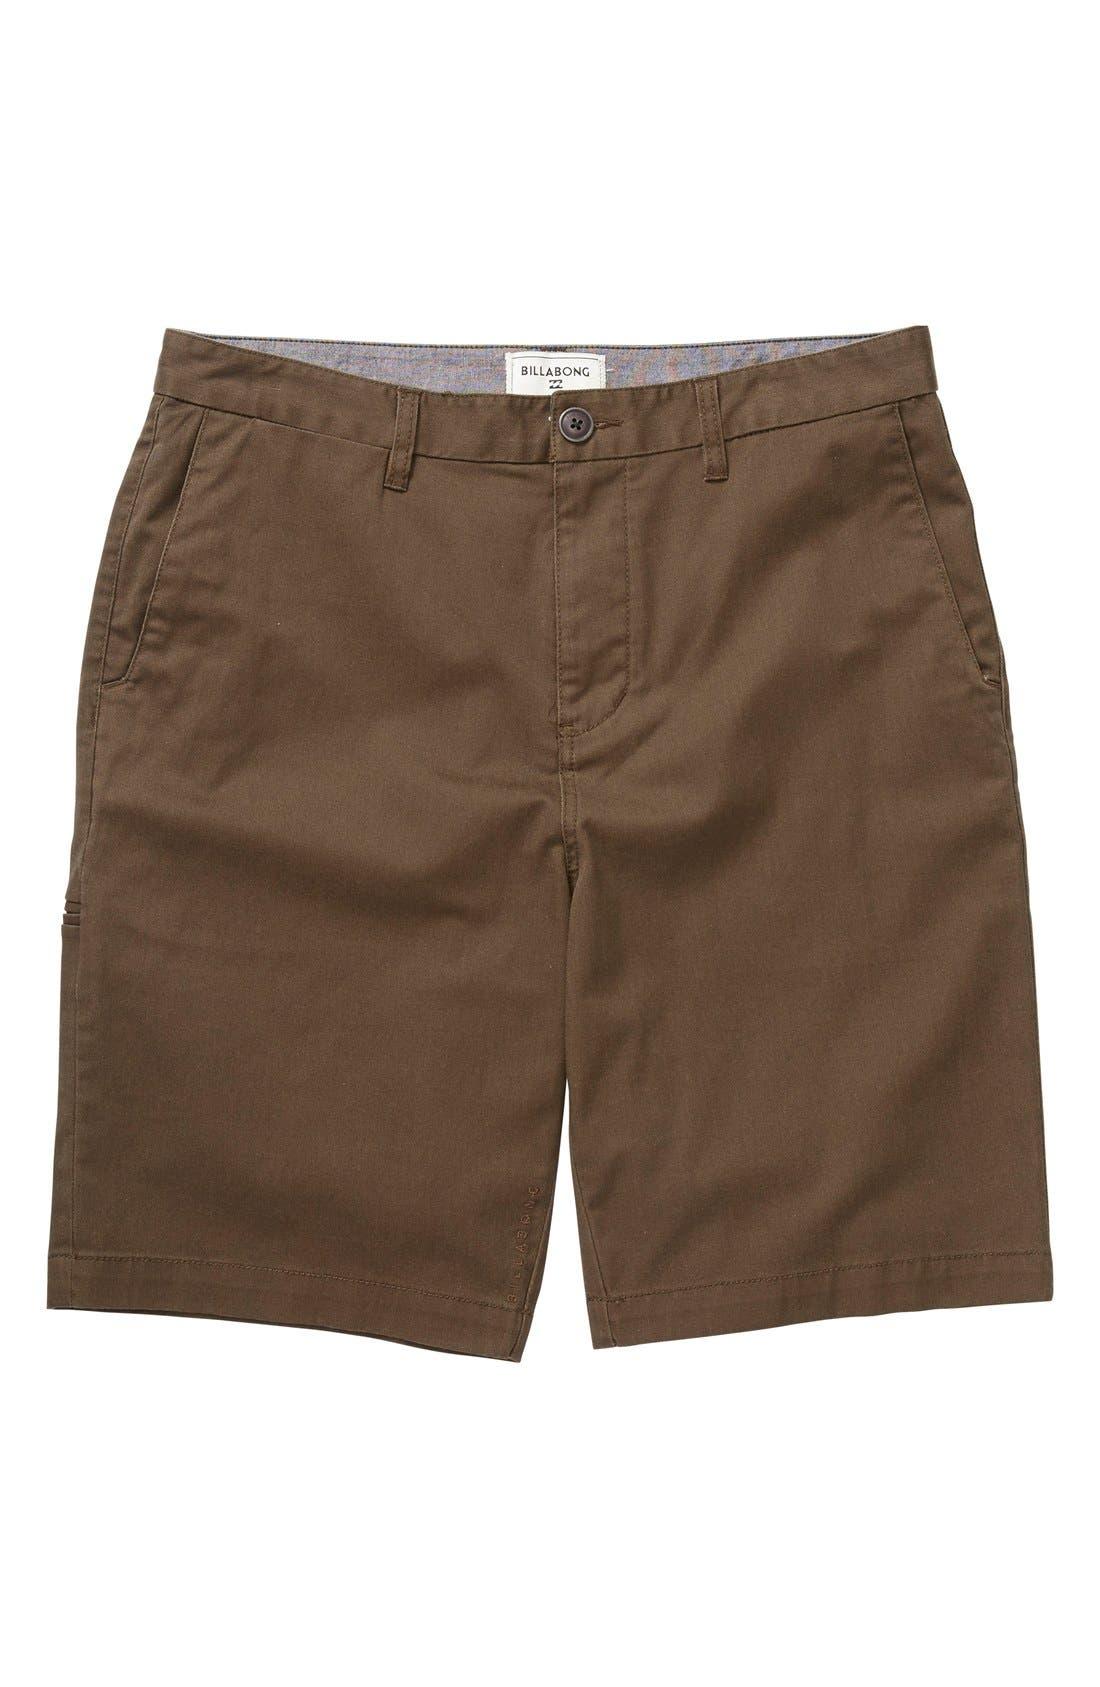 Main Image - Billabong 'Carter' Cotton Twill Shorts (Toddler Boys & Little Boys)